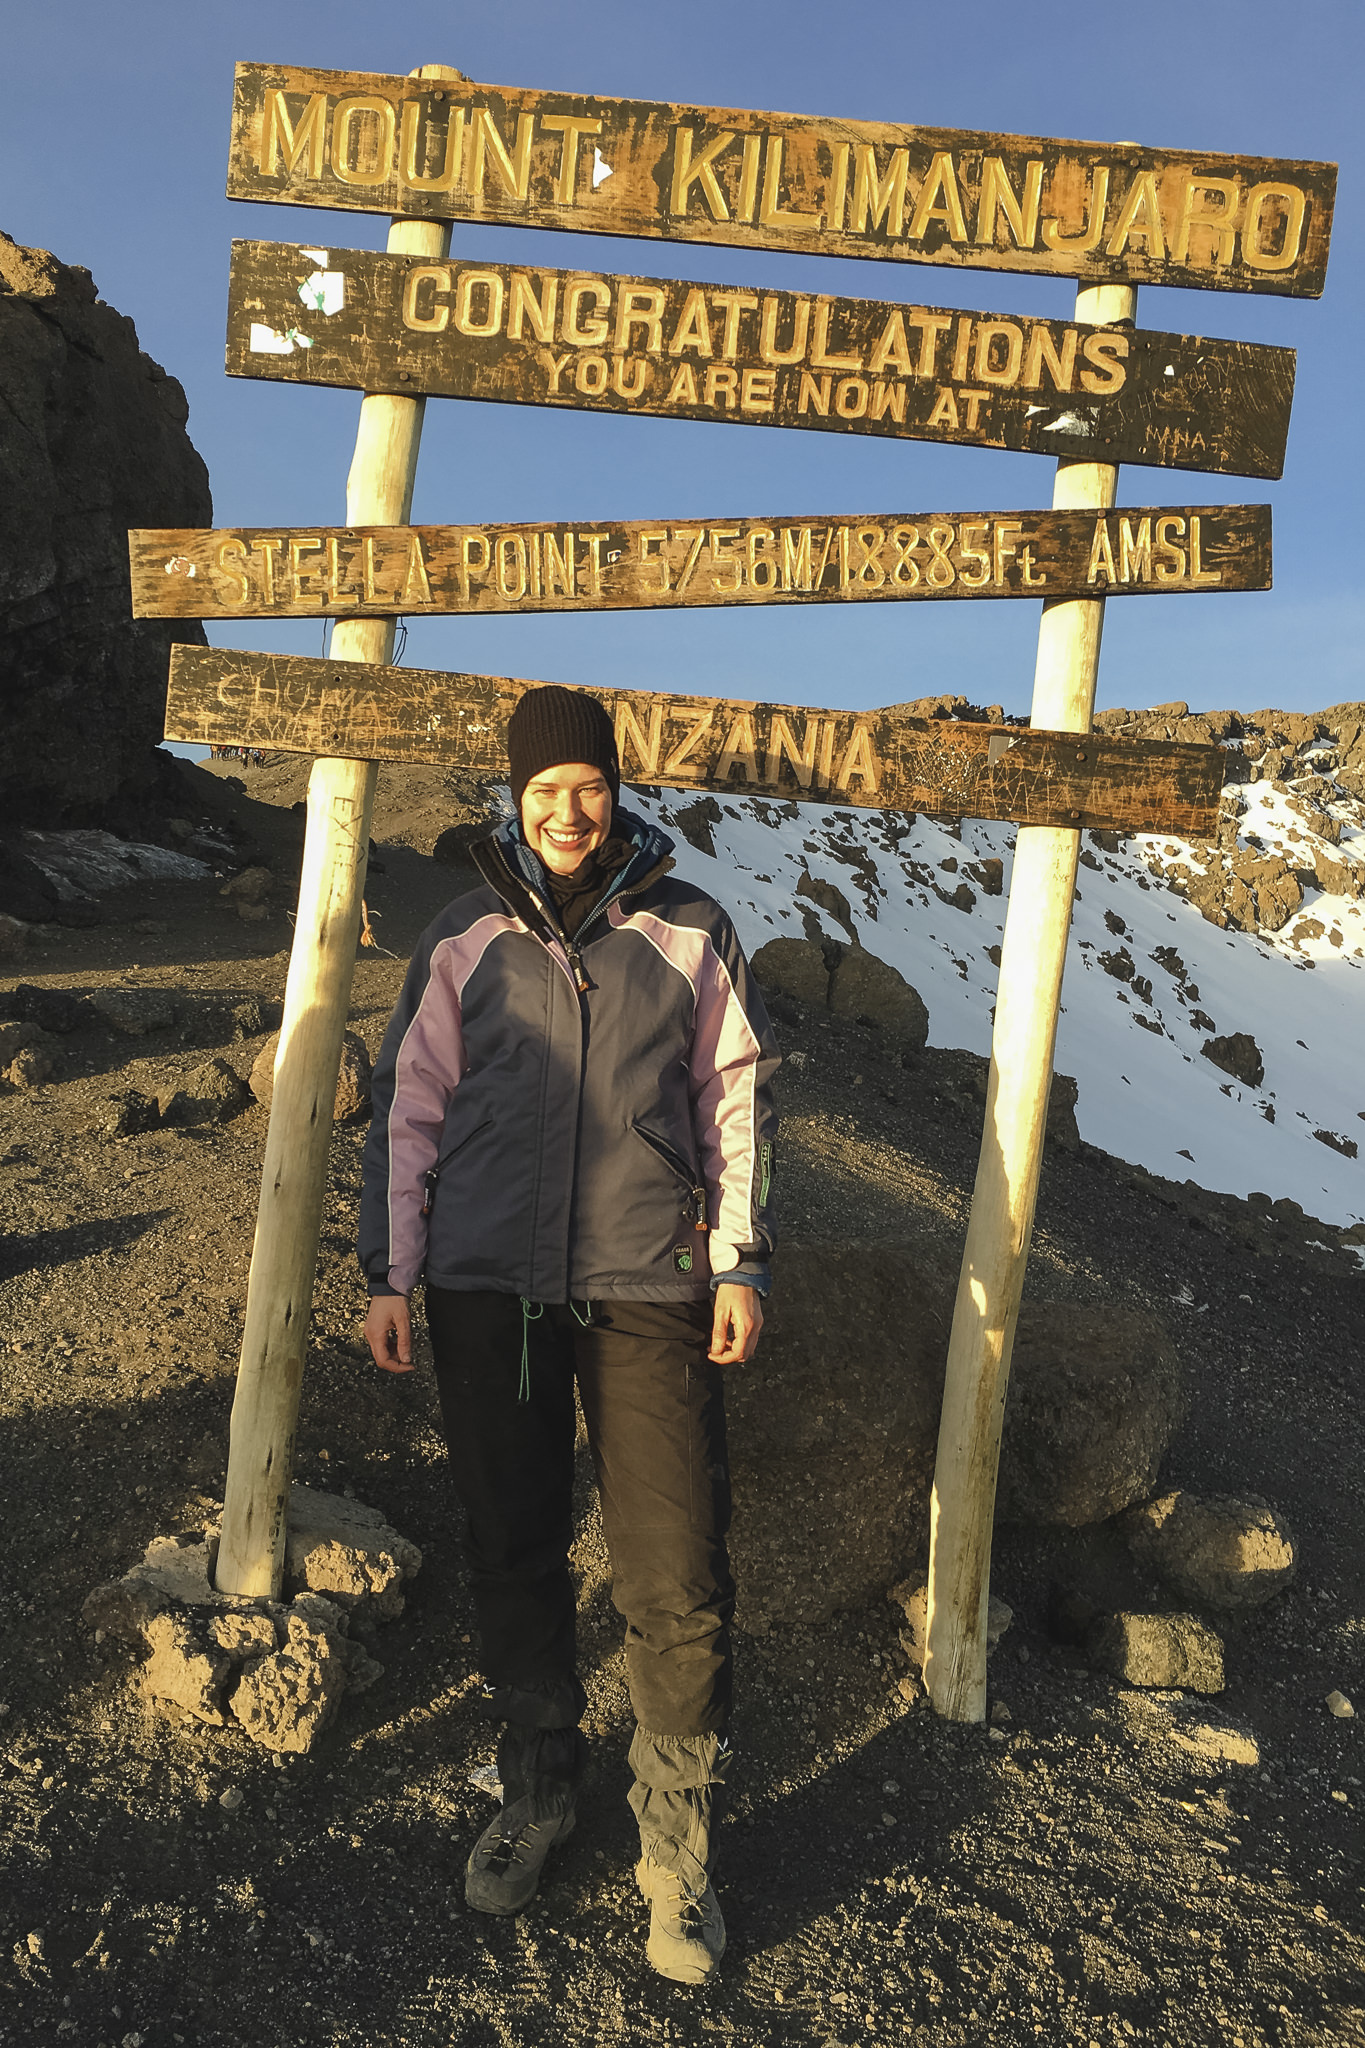 Kilimanjaro - 217